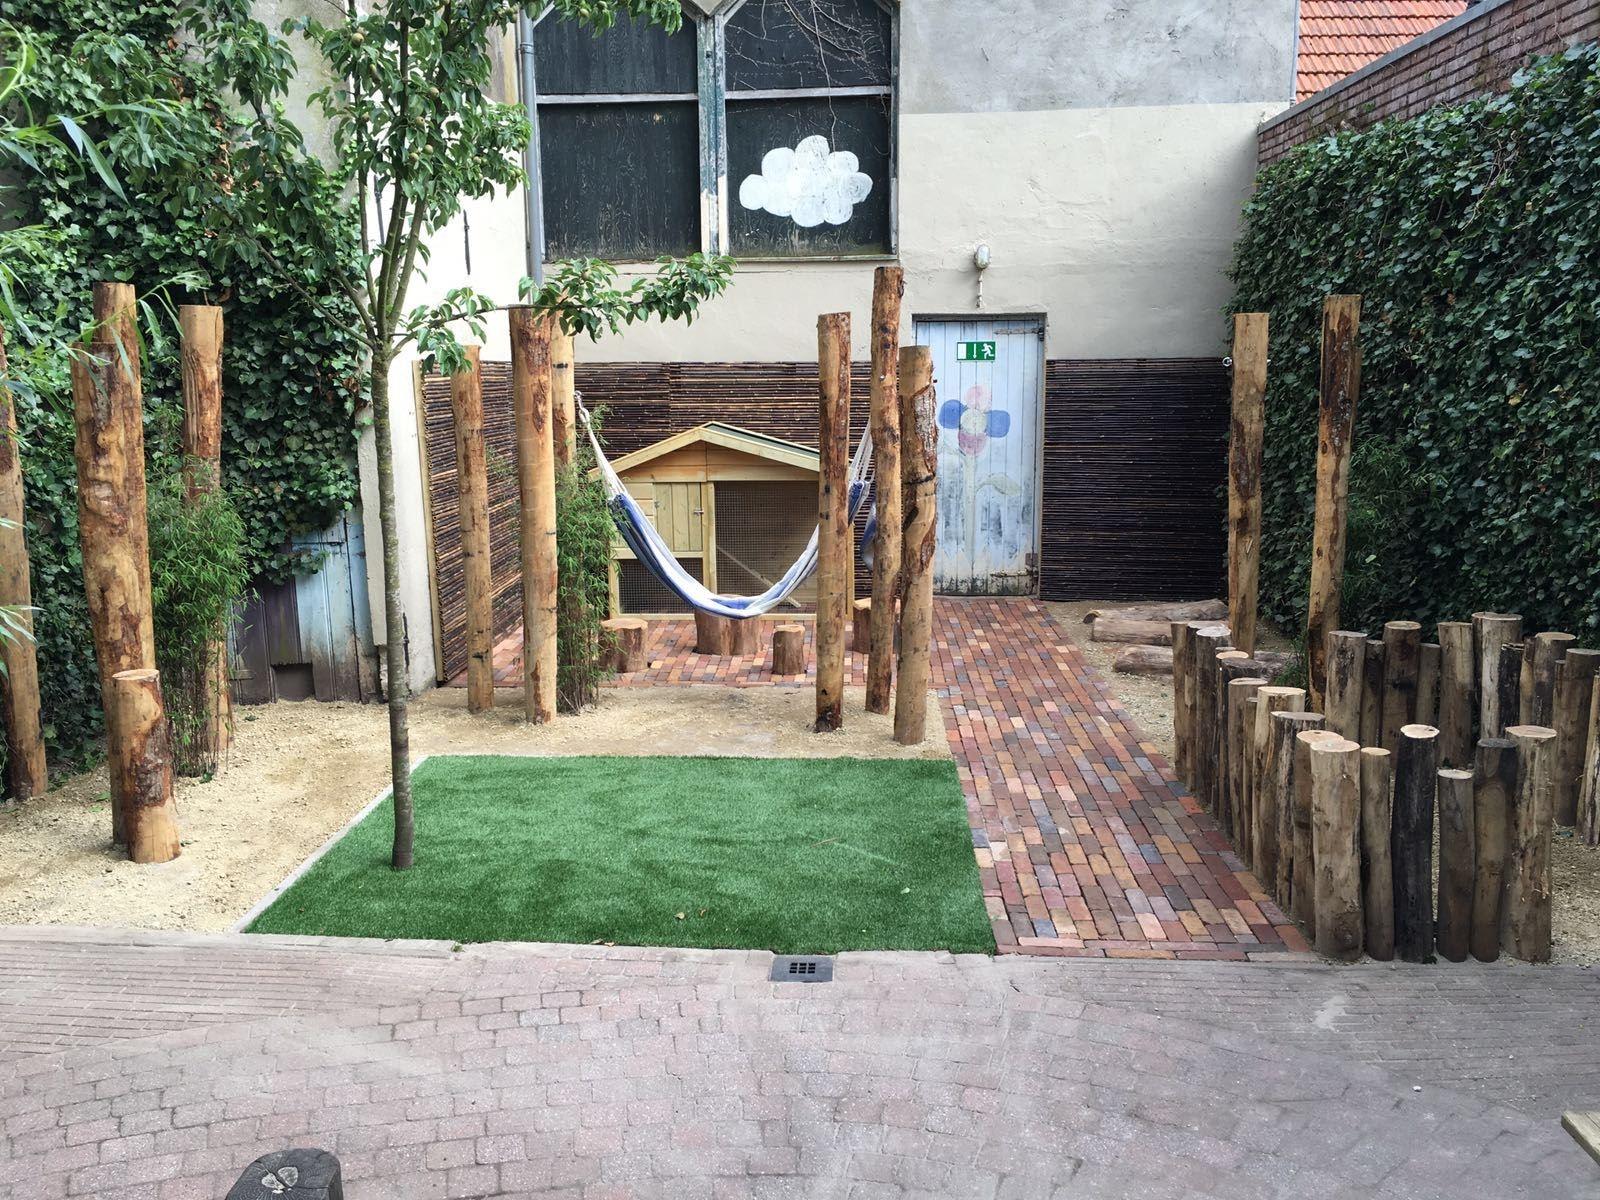 Hoveniersbedrijf Isidorus Hoeve Kinderdagverblijf tuin